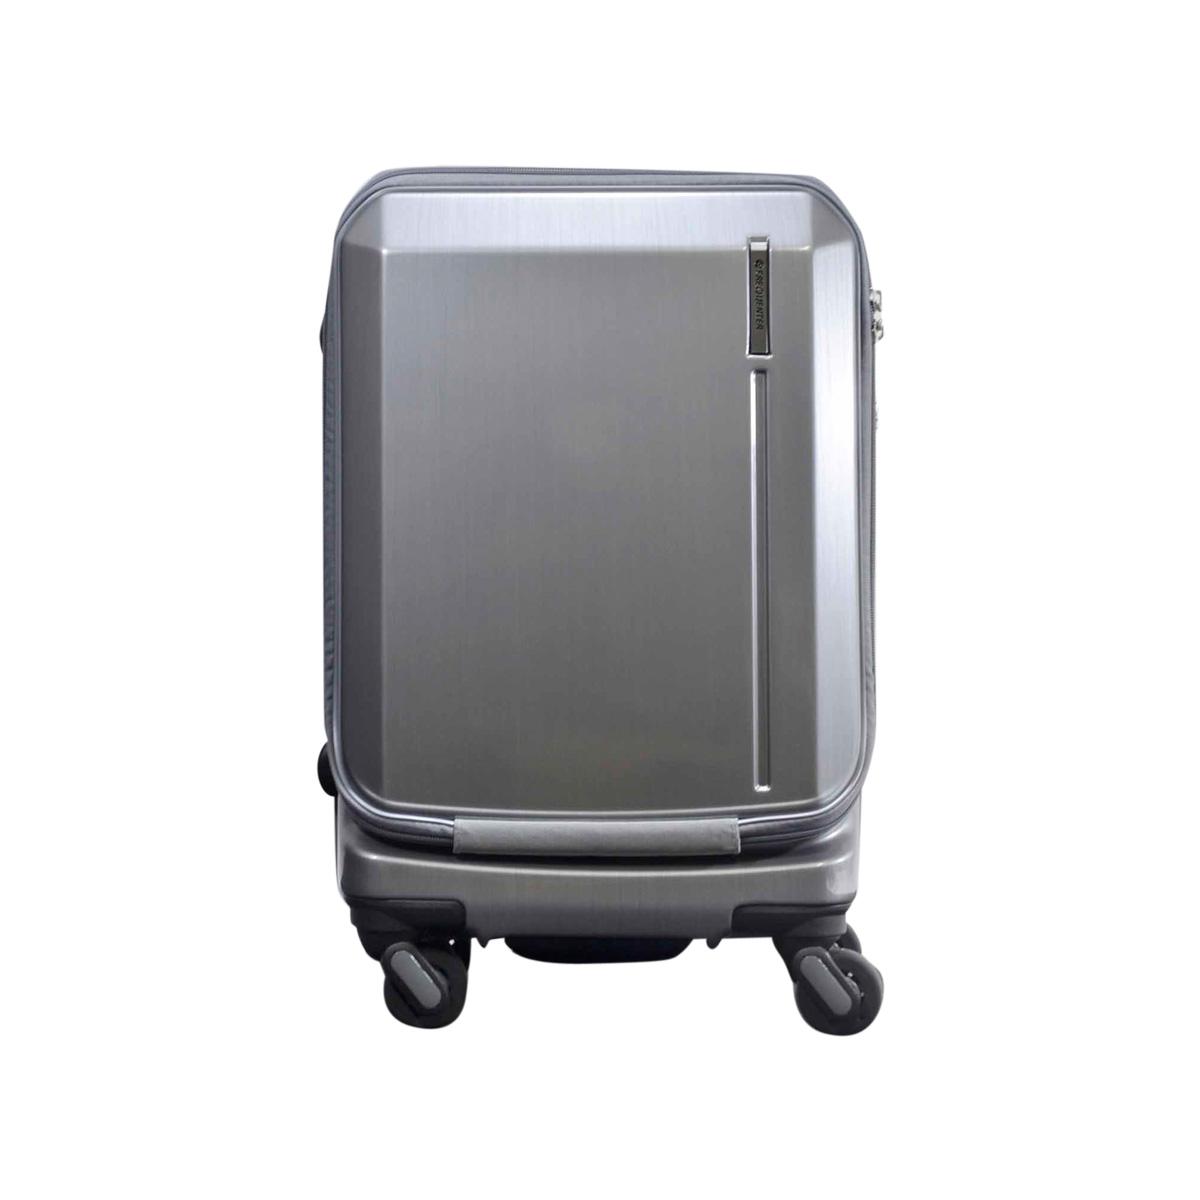 FREQUENTER GRAND フリクエンター グランド スーツケース キャリーケース キャリーバッグ メンズ 34L ブラック グレー ネイビー 黒 1-360 [4/13 新入荷]